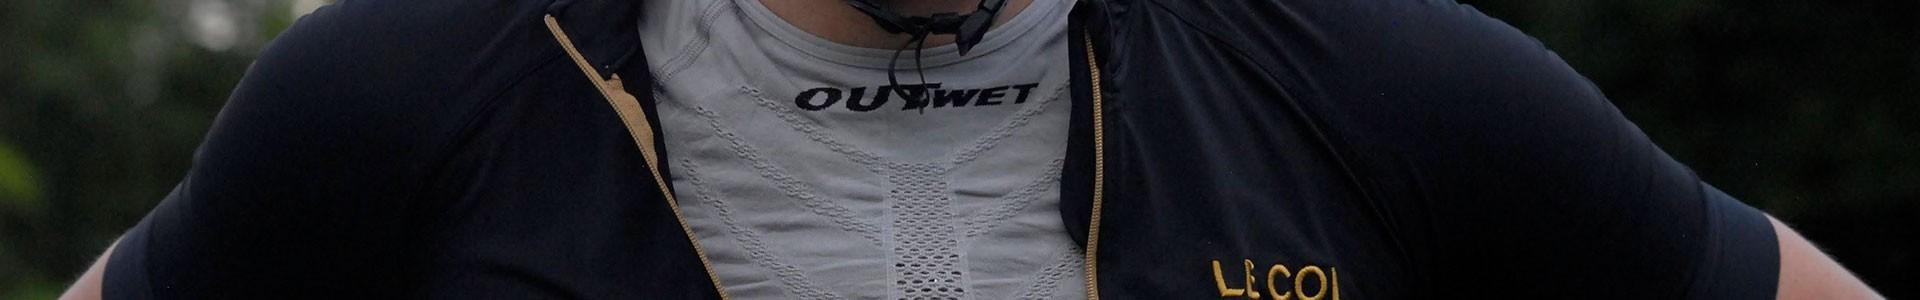 Fahrradunterhemden | Radunterhemden | Top Qualität | Funktion